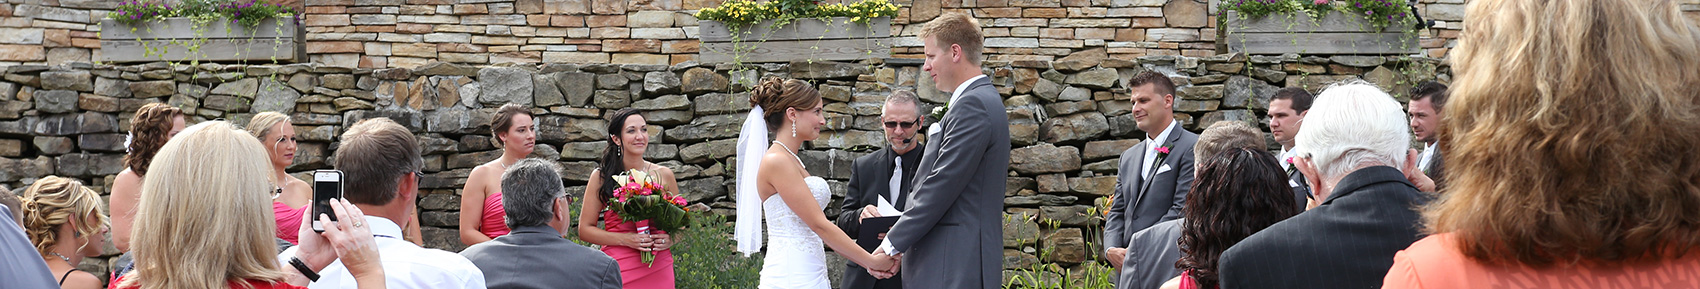 wedding-heading-9